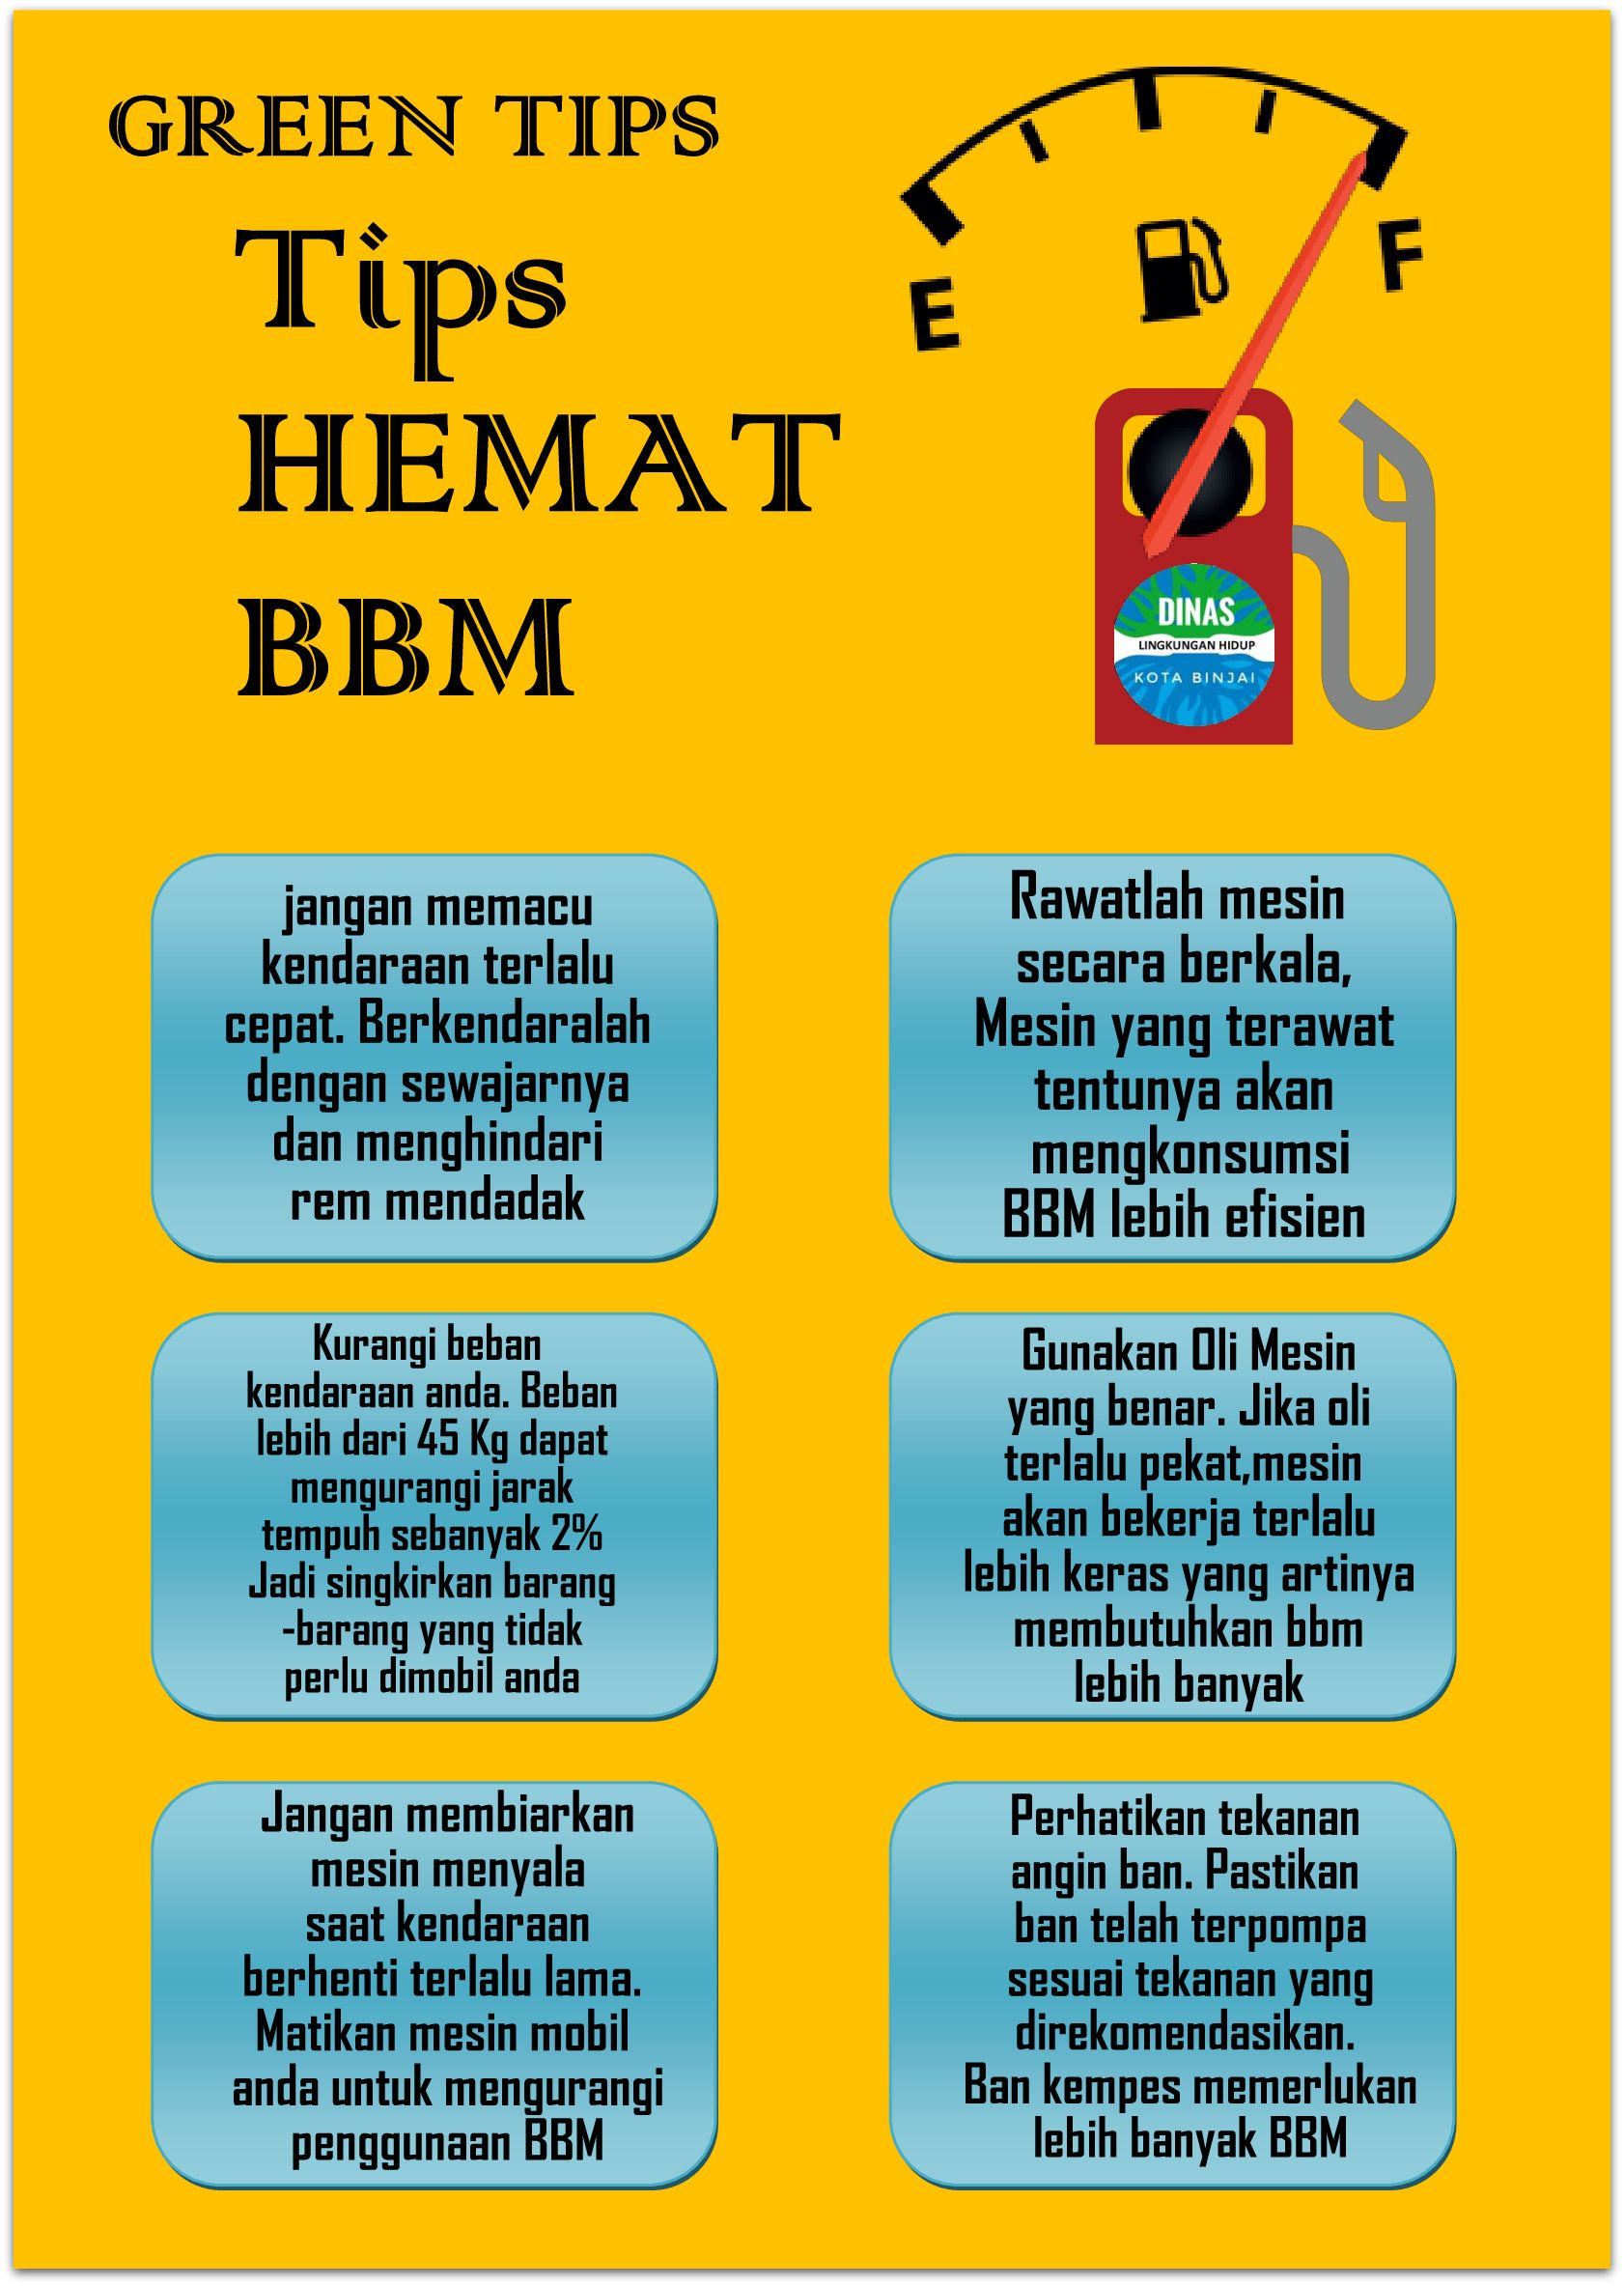 Tips Hemat Bahan Bakar Minyak Tips Hemat Lingkungan Hidup